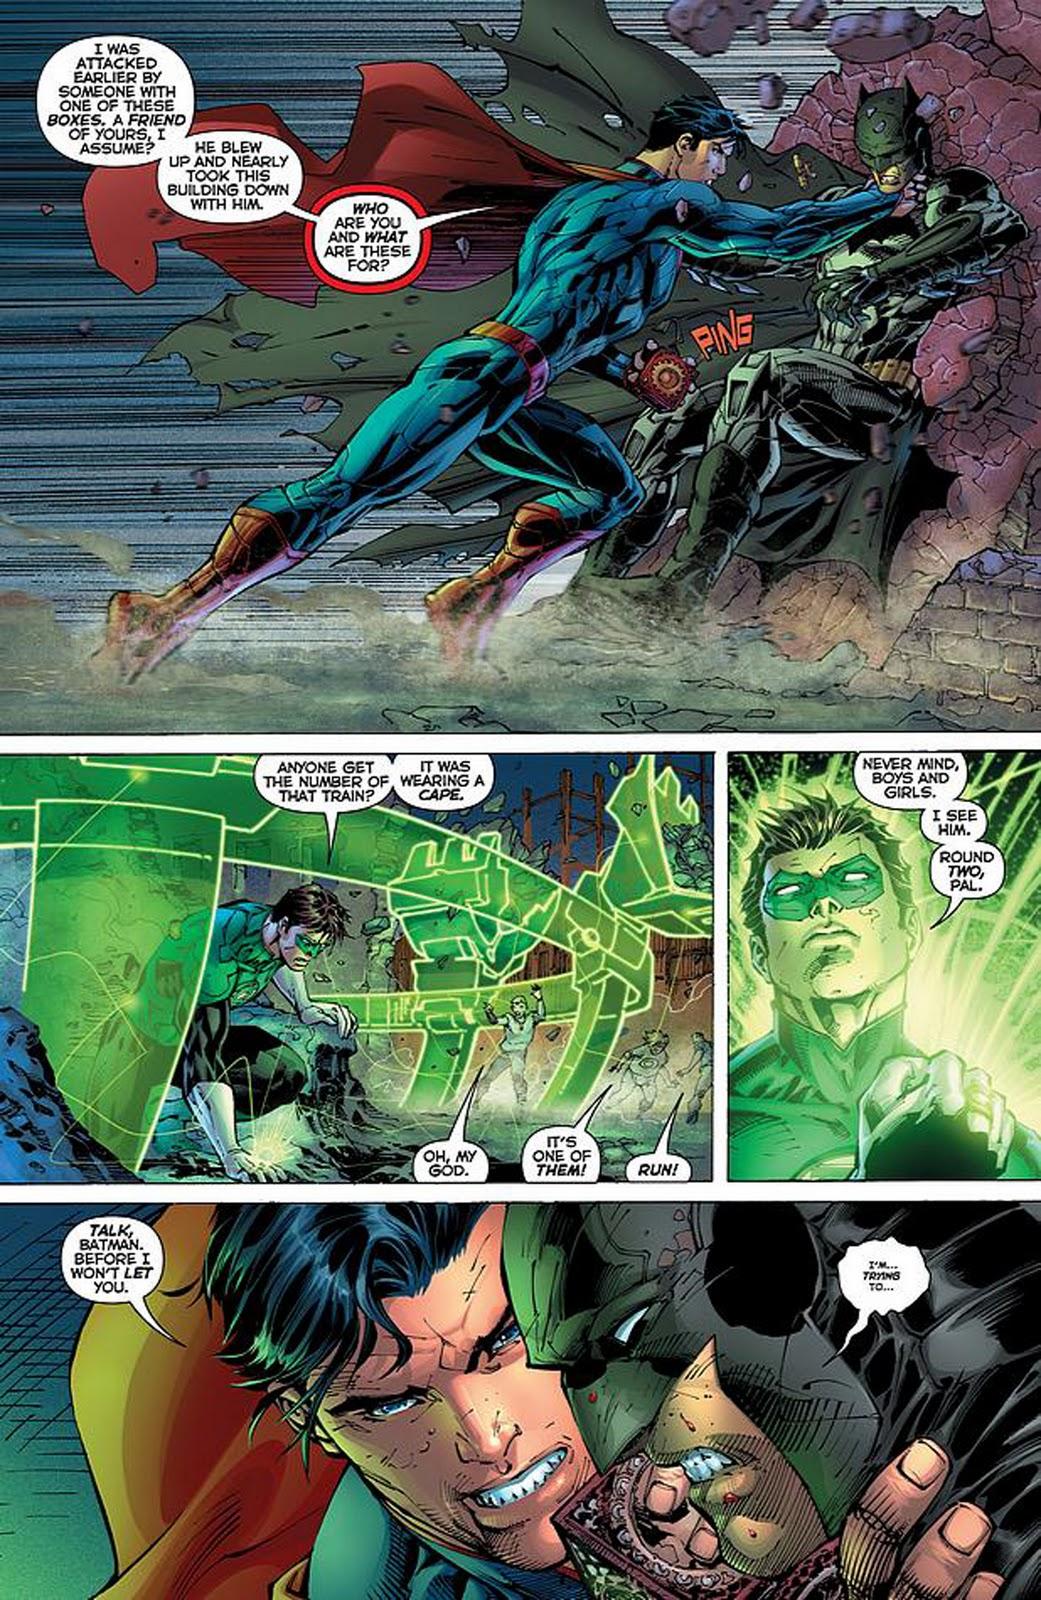 Deathstroke and Batman vs The Justice league - Battles ... | 1041 x 1600 jpeg 466kB